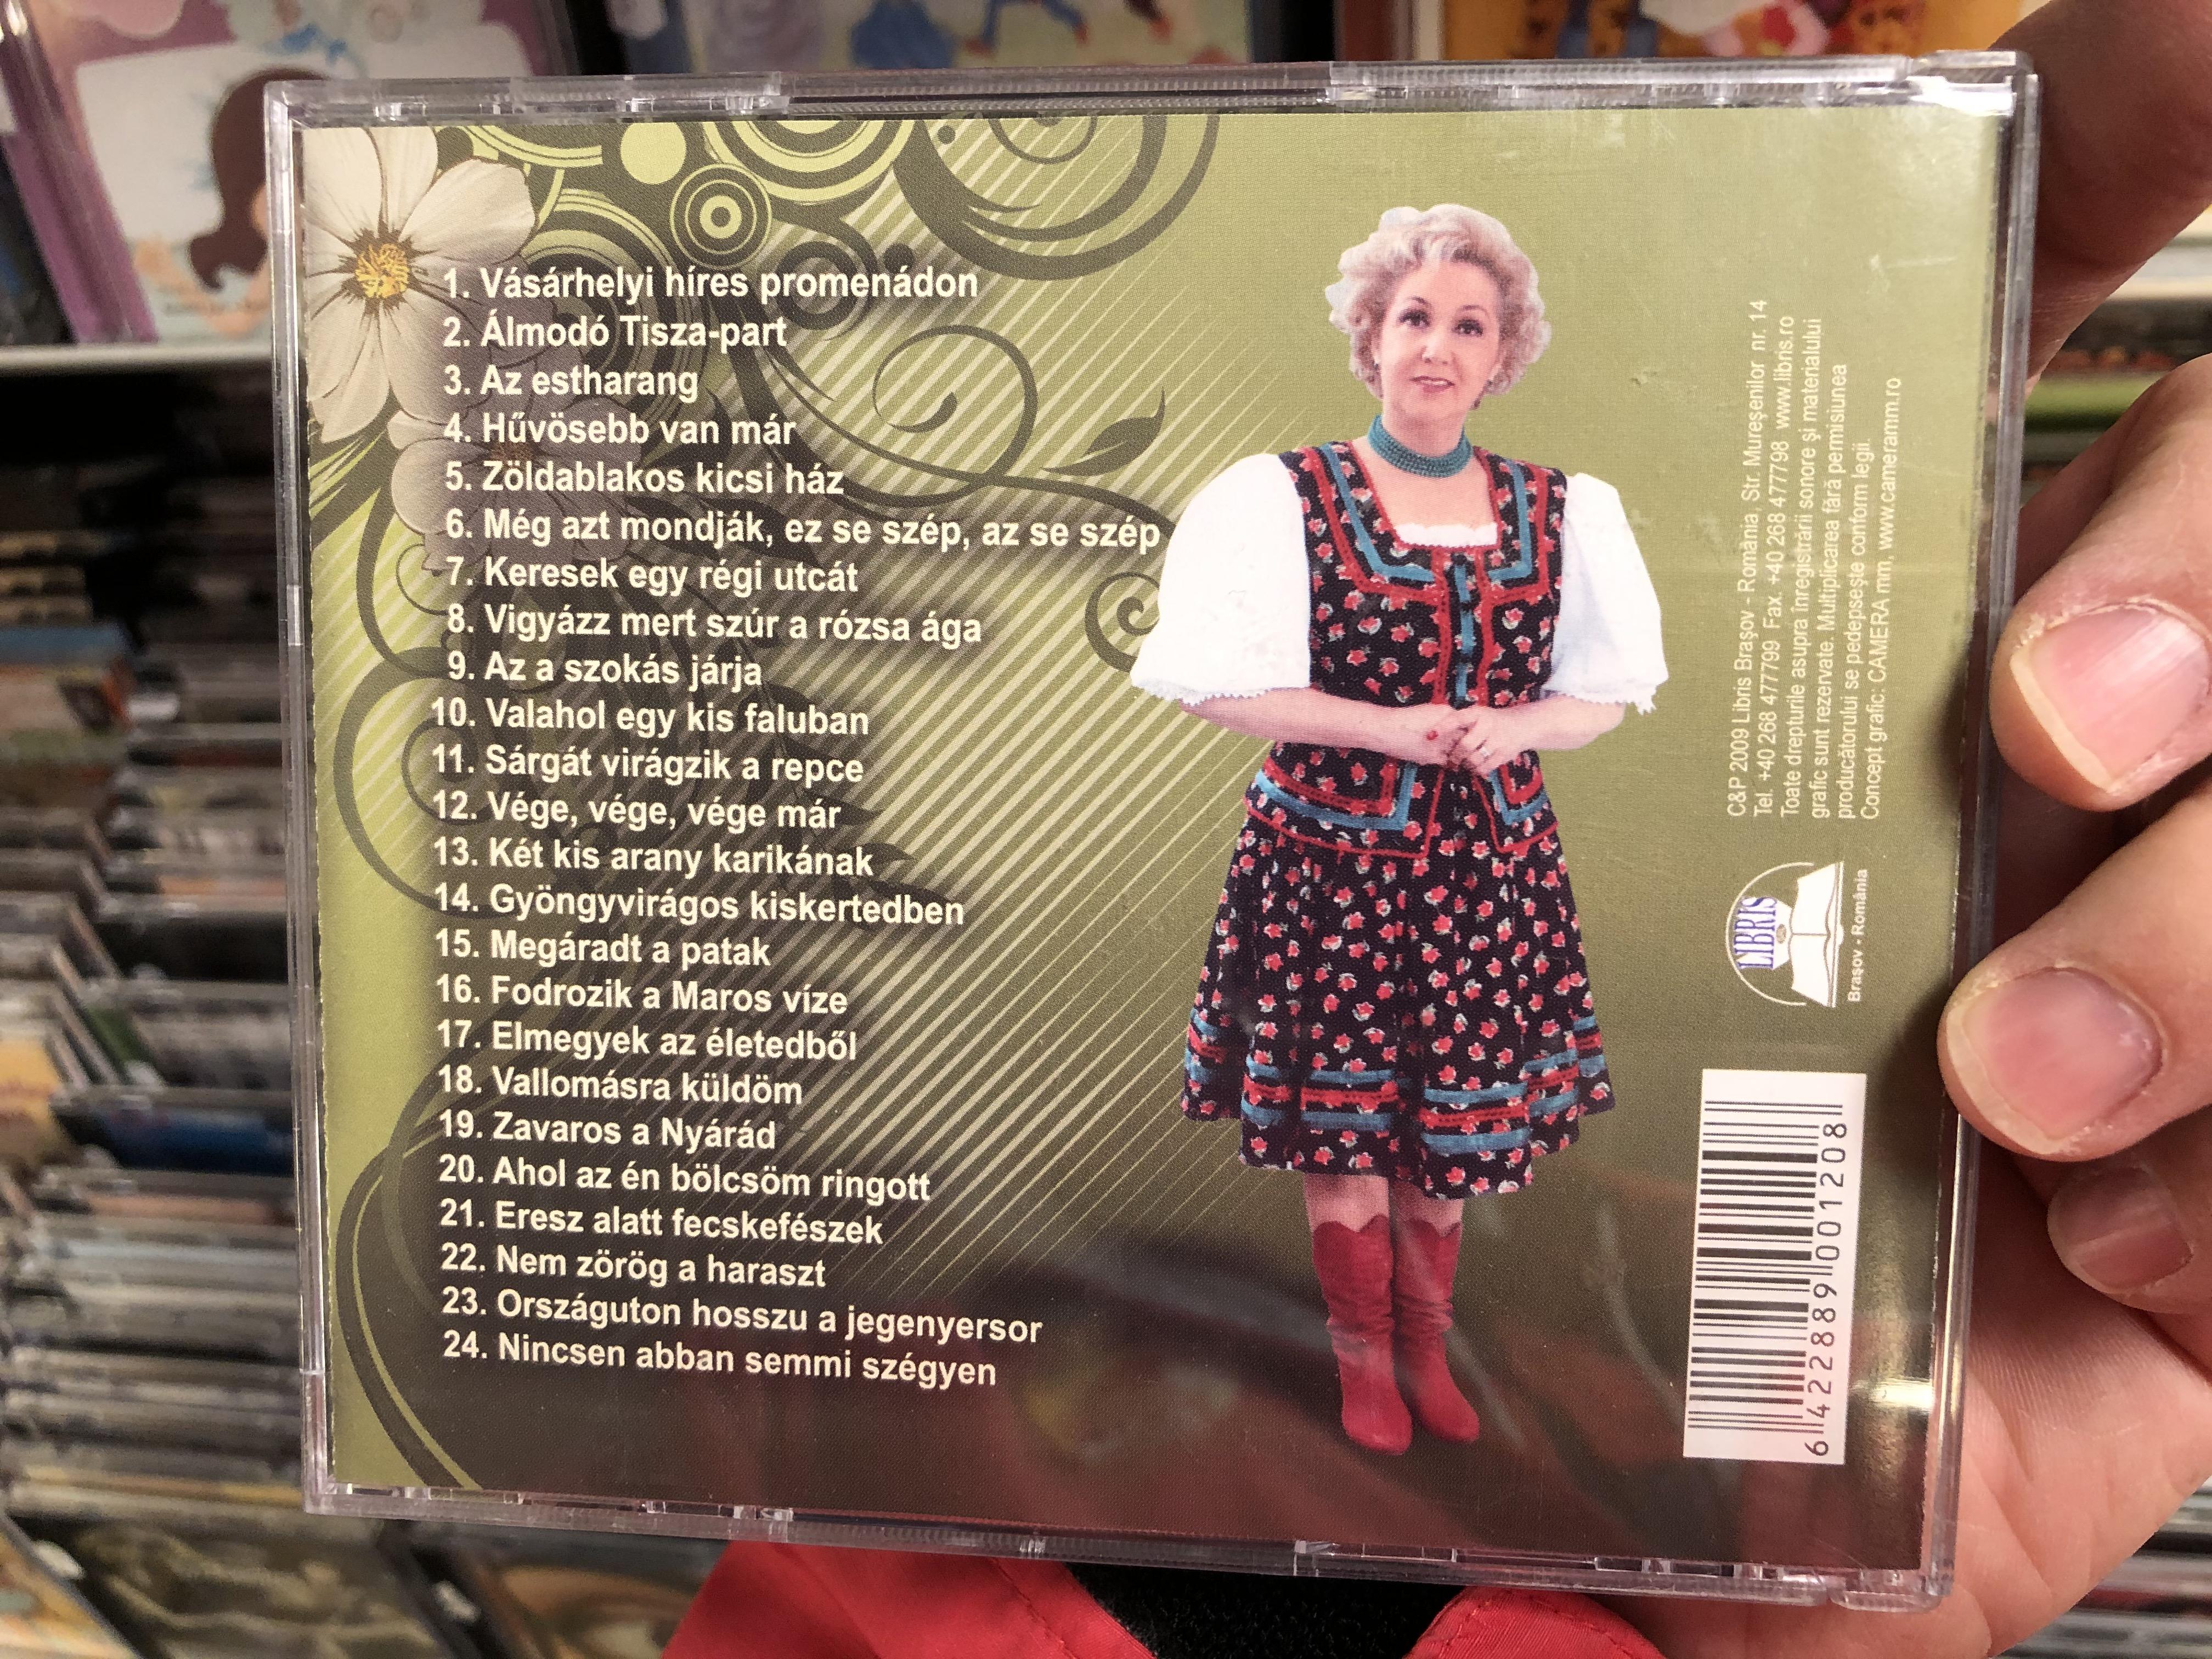 keresek-egy-r-gi-notat-ko-s-va-kiser-santa-ferenc-libris-audio-cd-2009-lb-121-2-.jpg